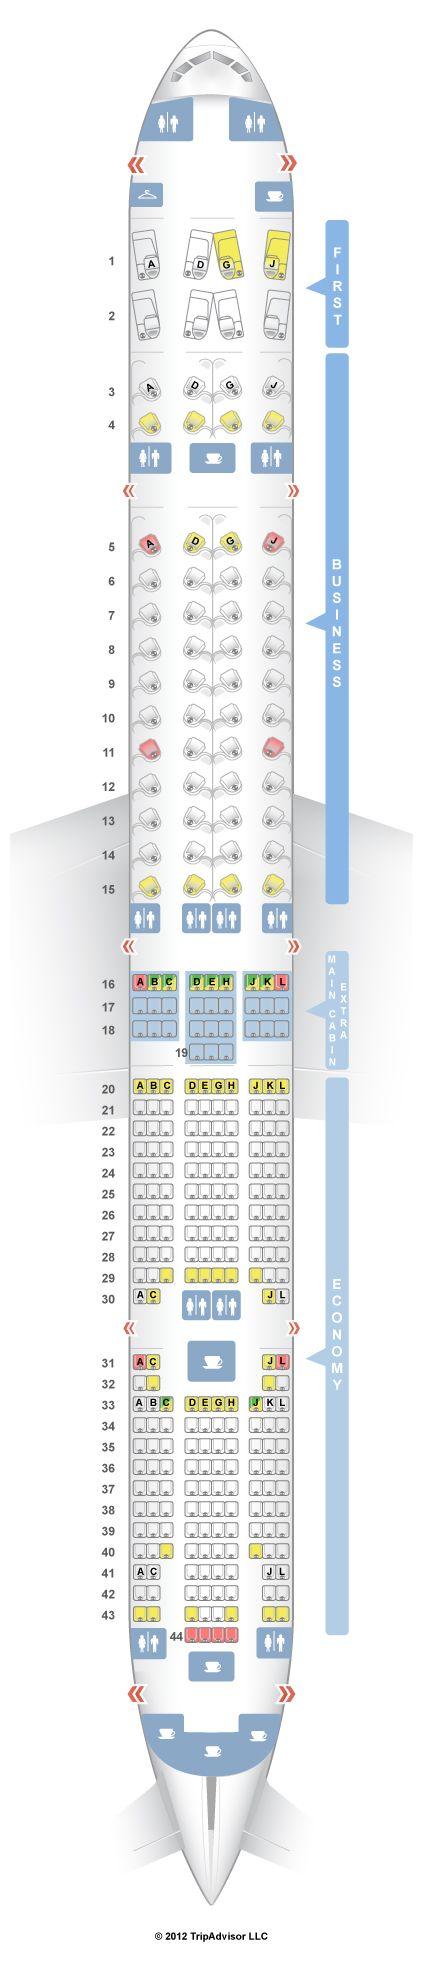 Seatguru Seat Map American Airlines Boeing 777 300er 77w London F24074102e0dcb309a9ffe453360e999 63543044716953441